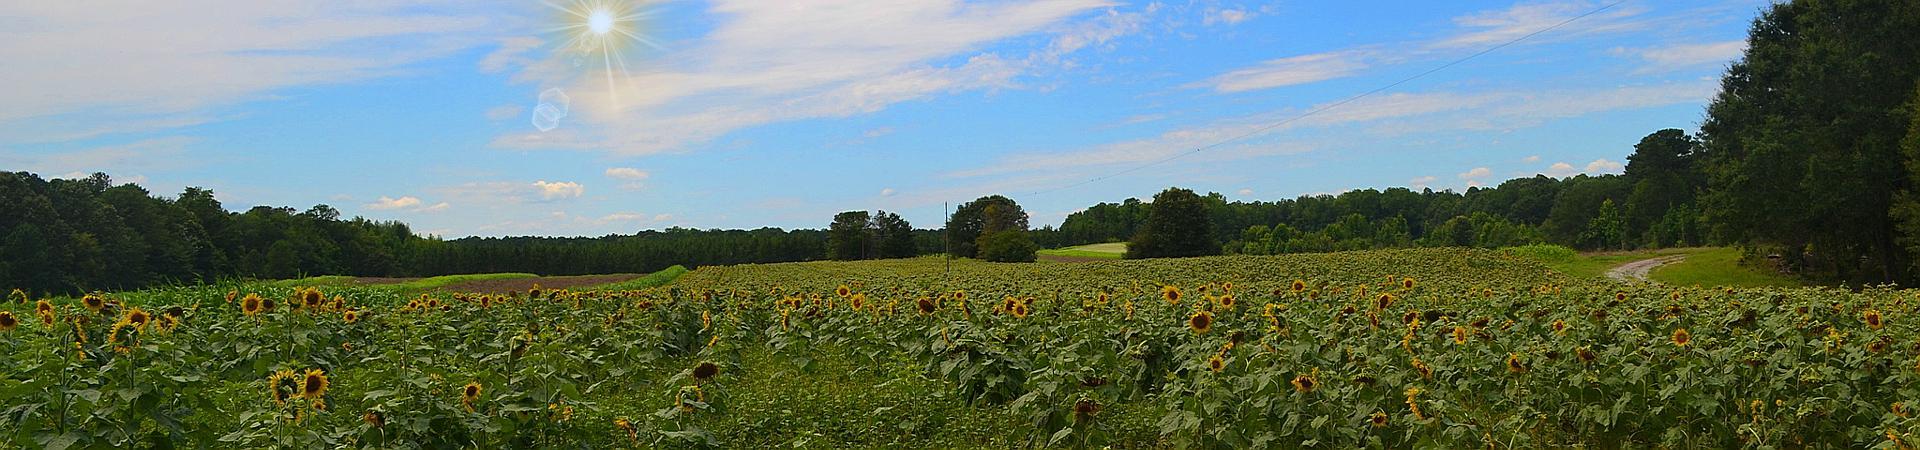 sunflowers in dove field at Joe Kruz WMA